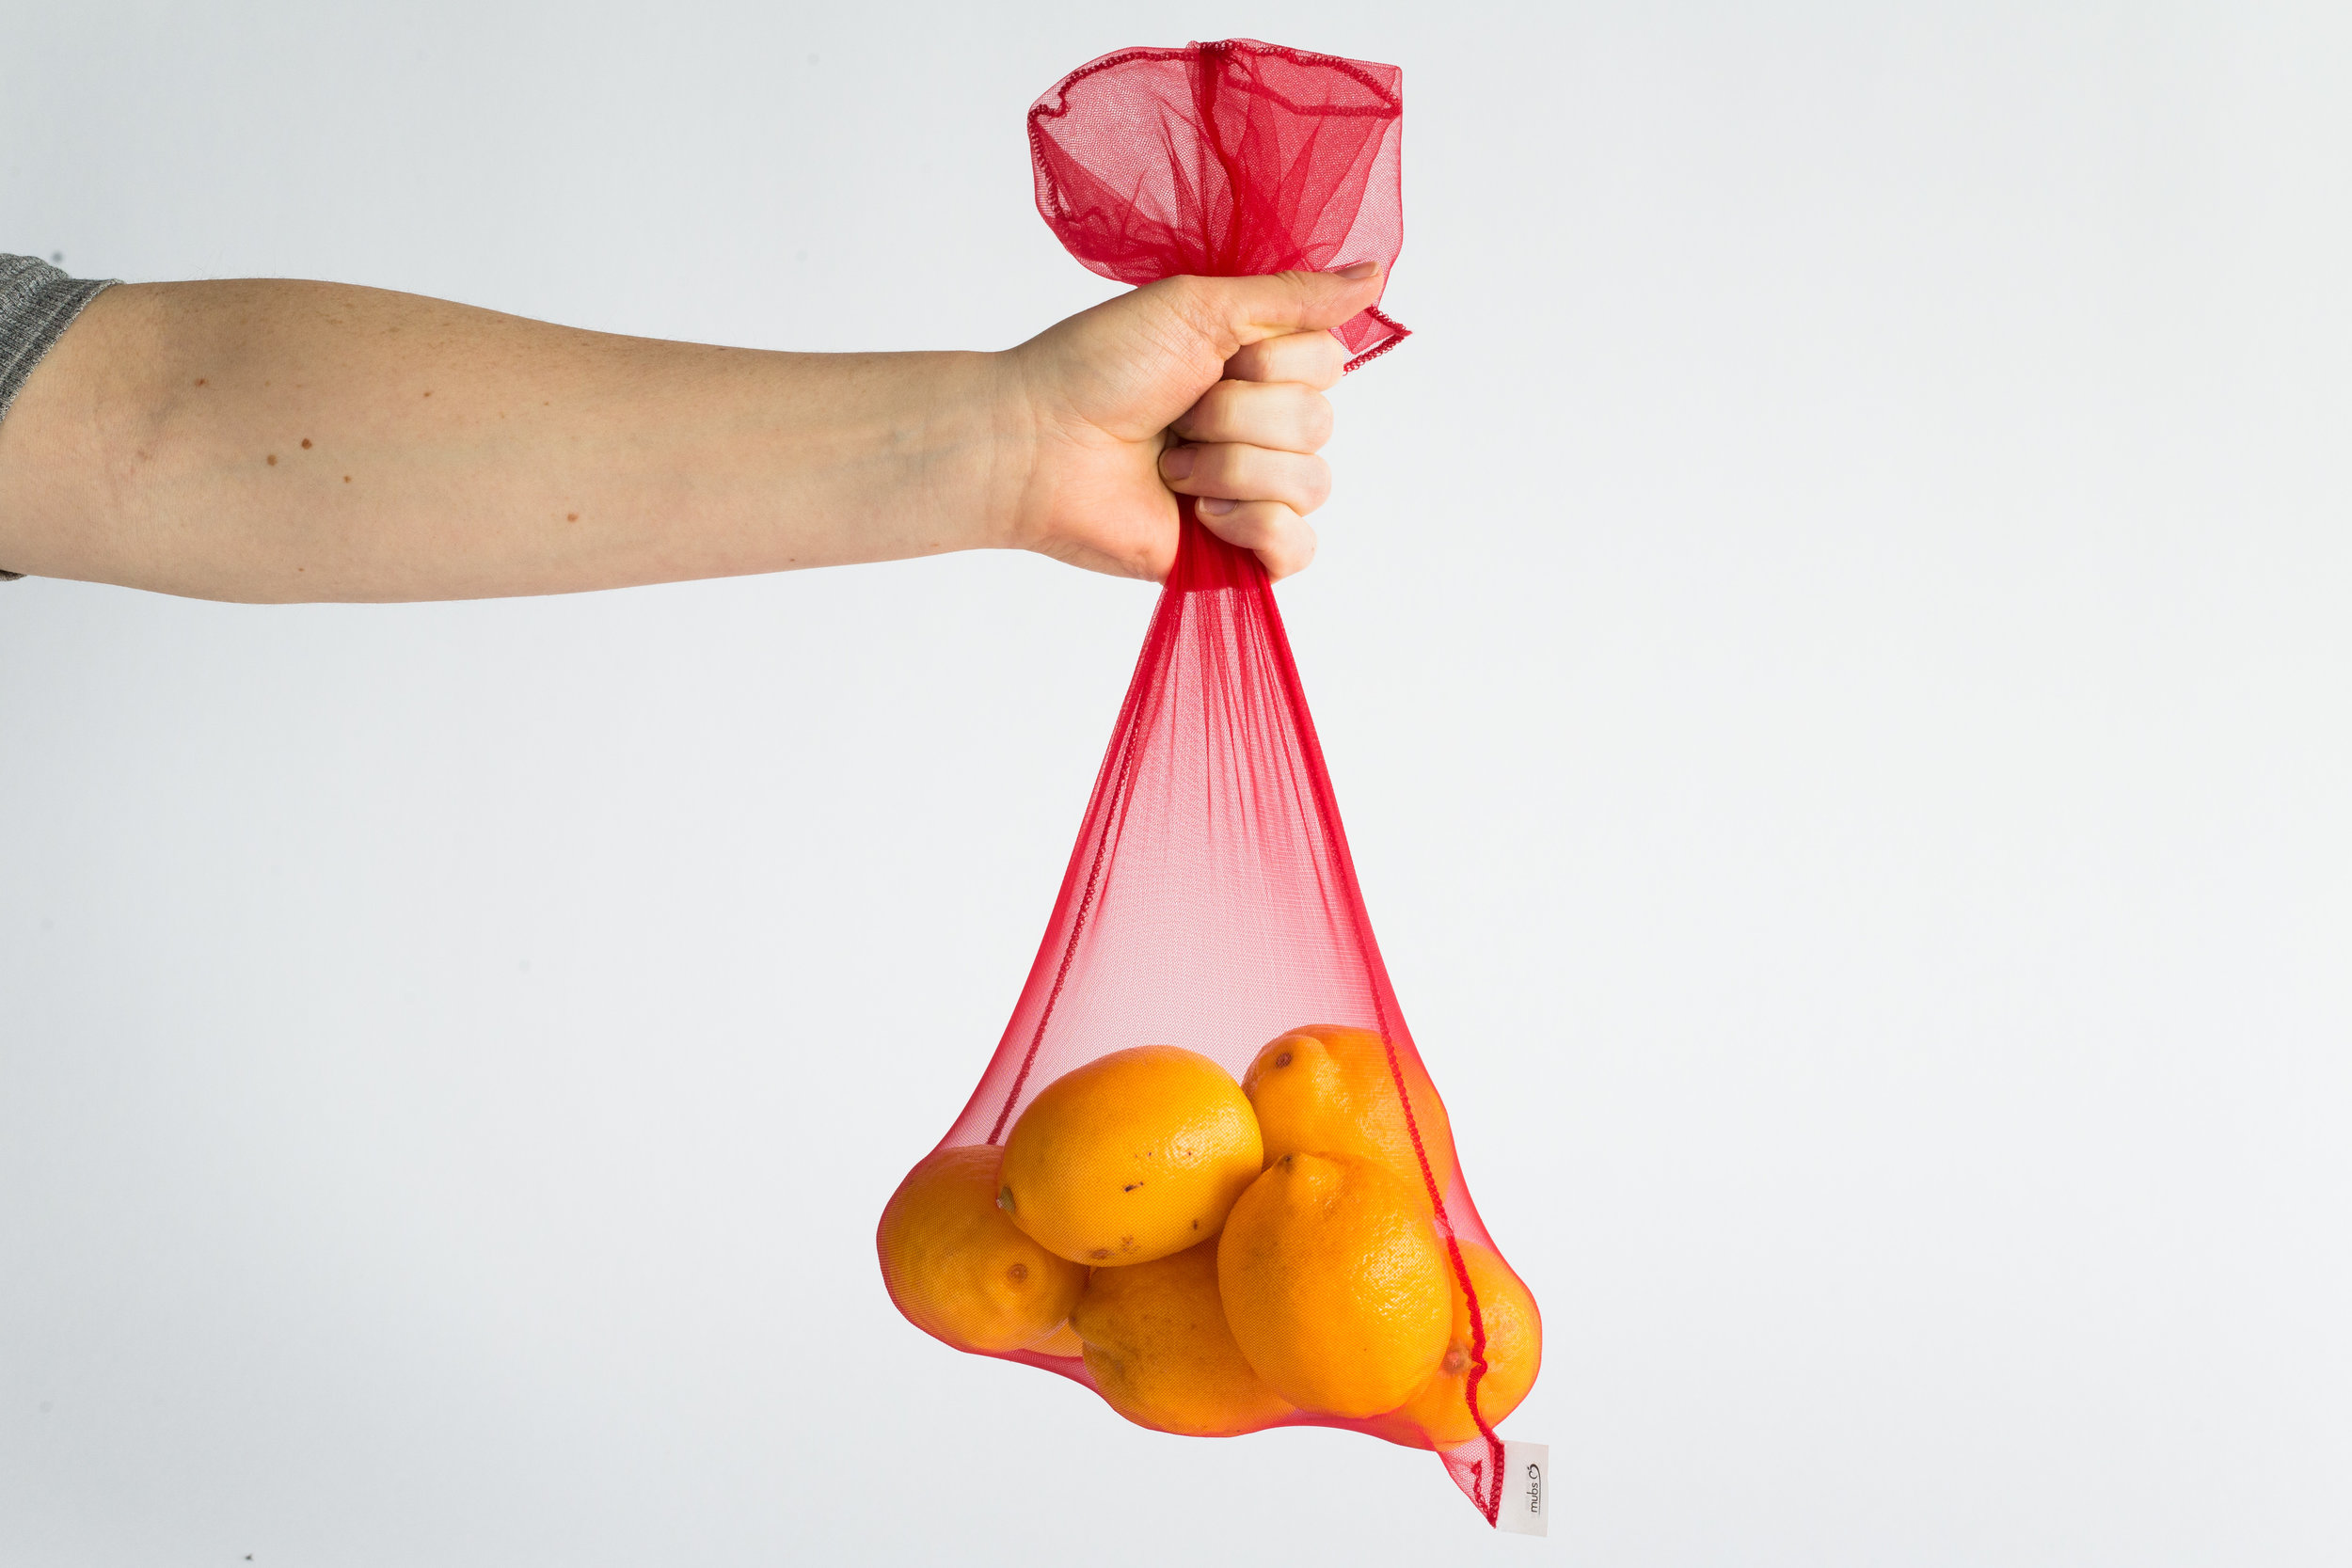 Resuable Produce Bag with Lemons.jpg